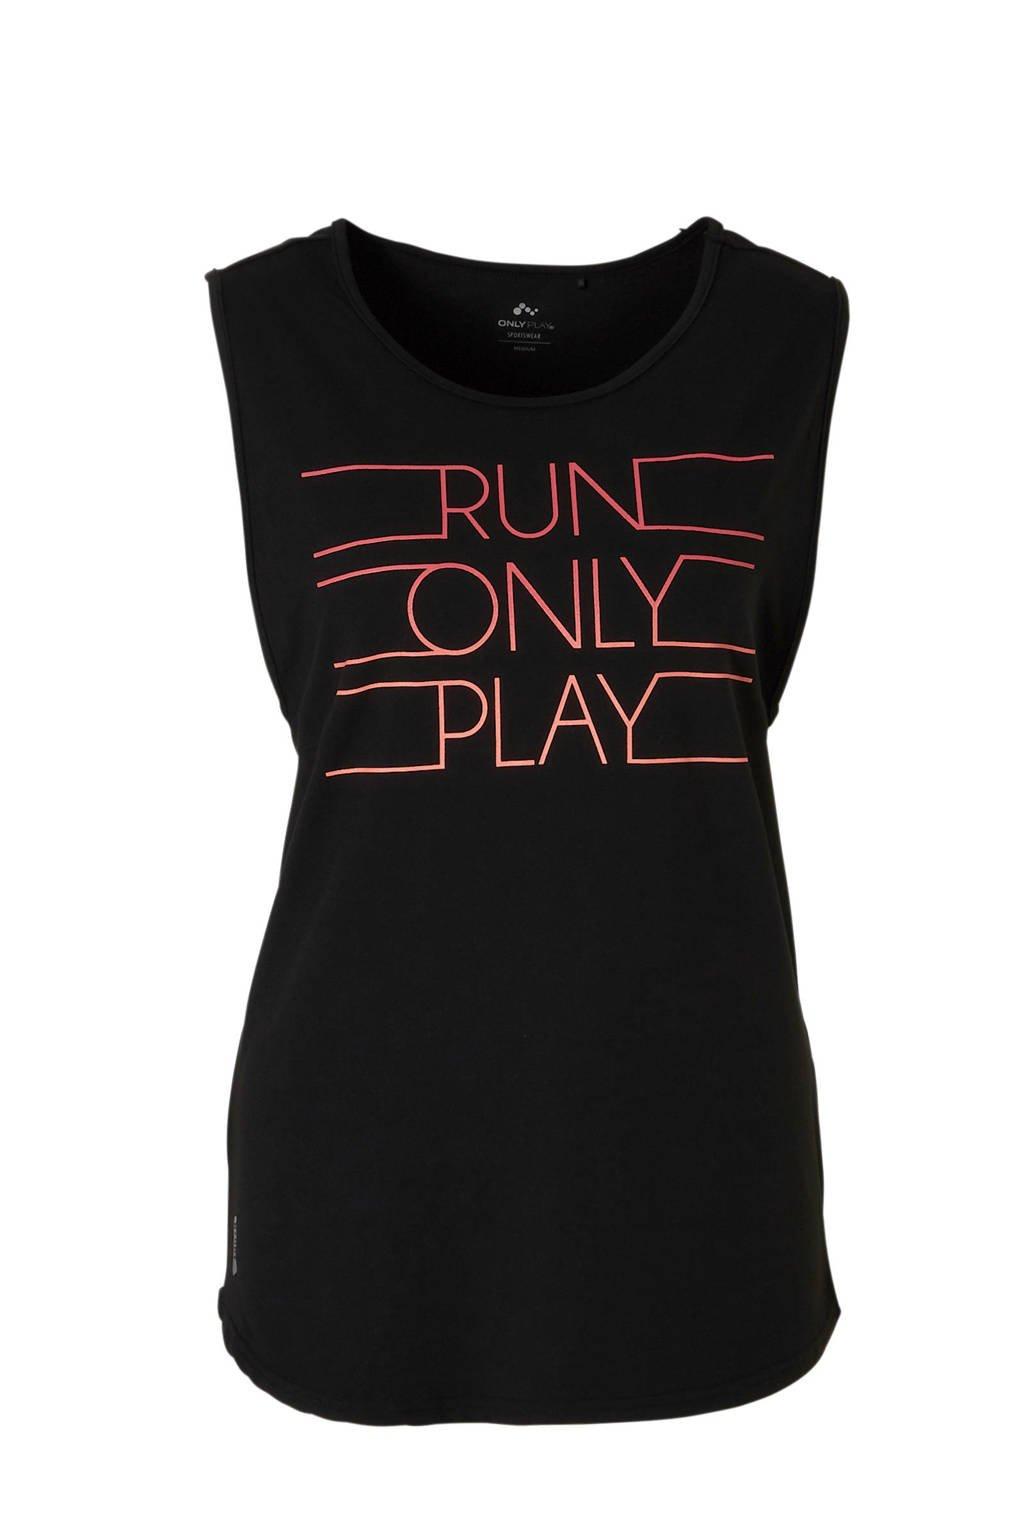 ONLY PLAY sporttop zwart, Zwart/roze